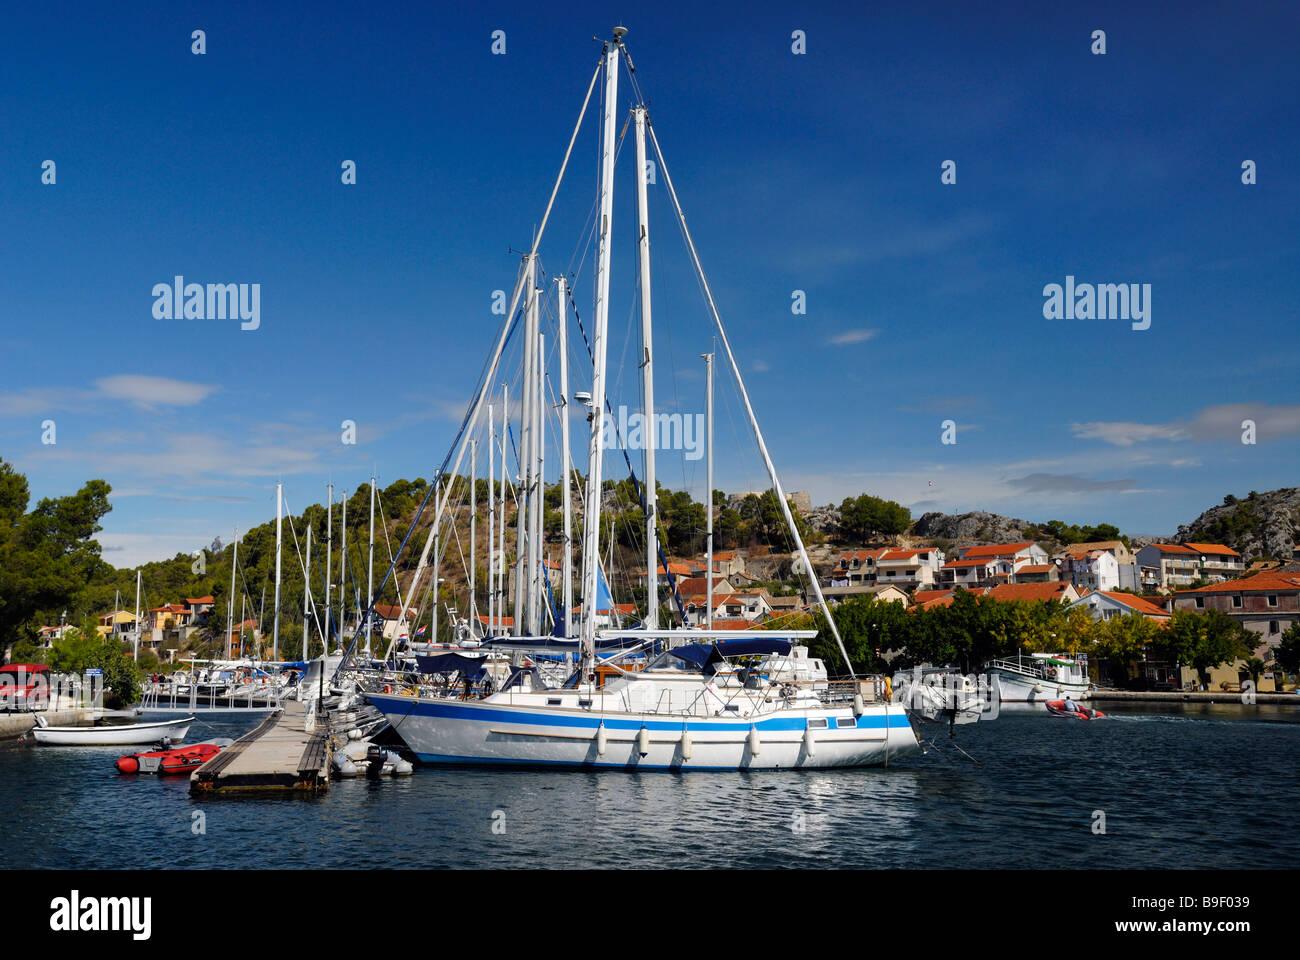 Yachts in marina at Skradin on Dalmatian Coast of Croatia - Stock Image